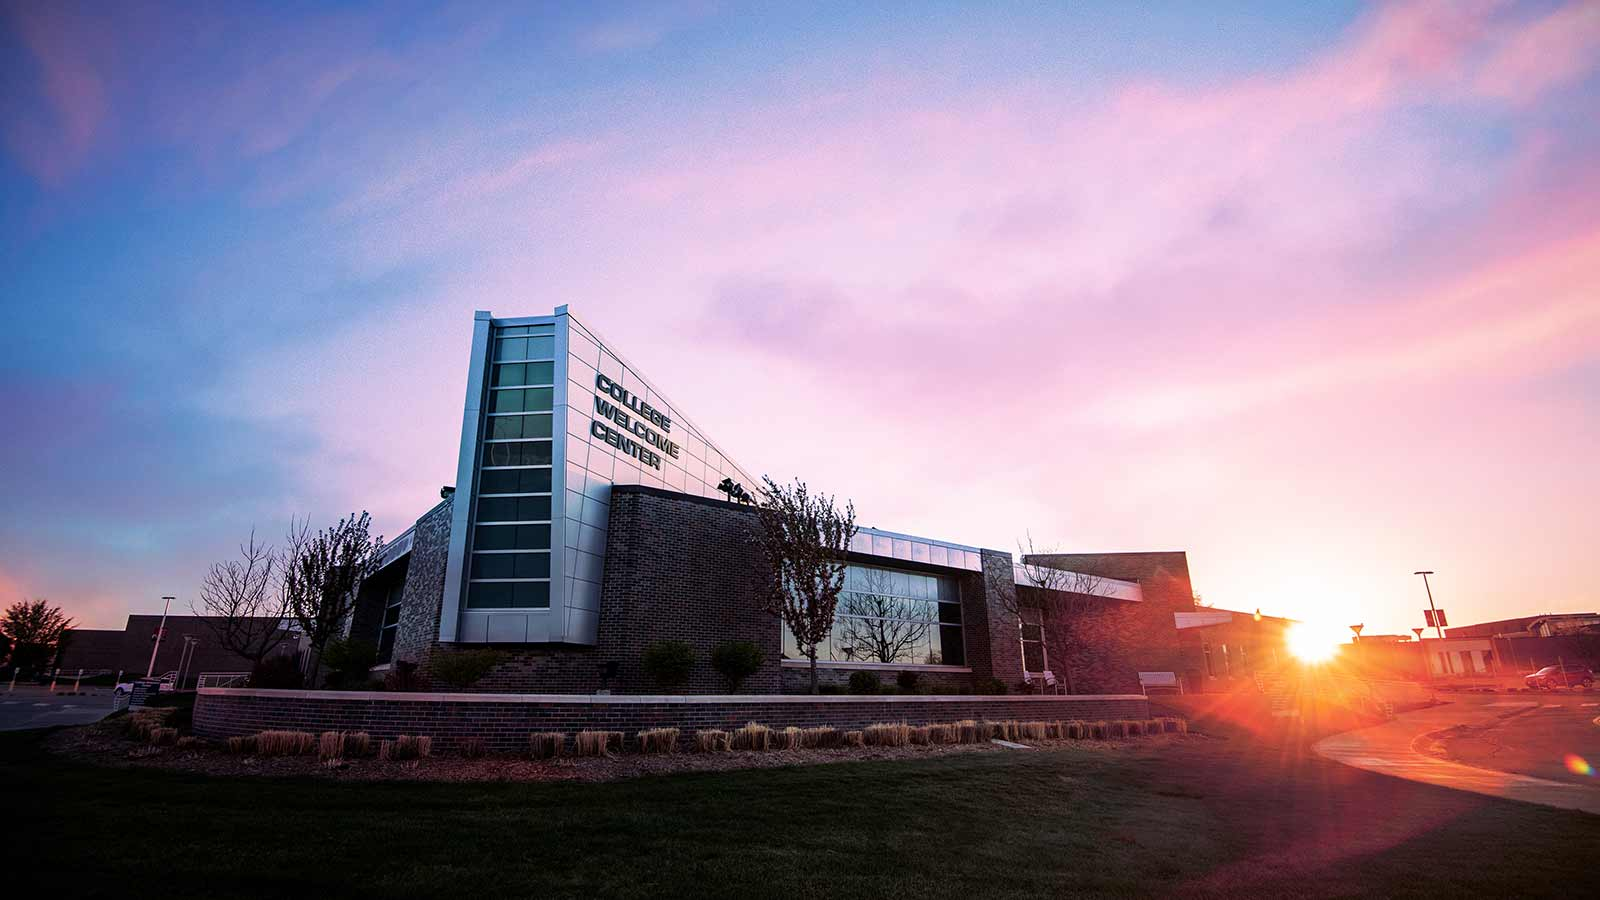 About Northeast Community College in Norfolk, Nebraska